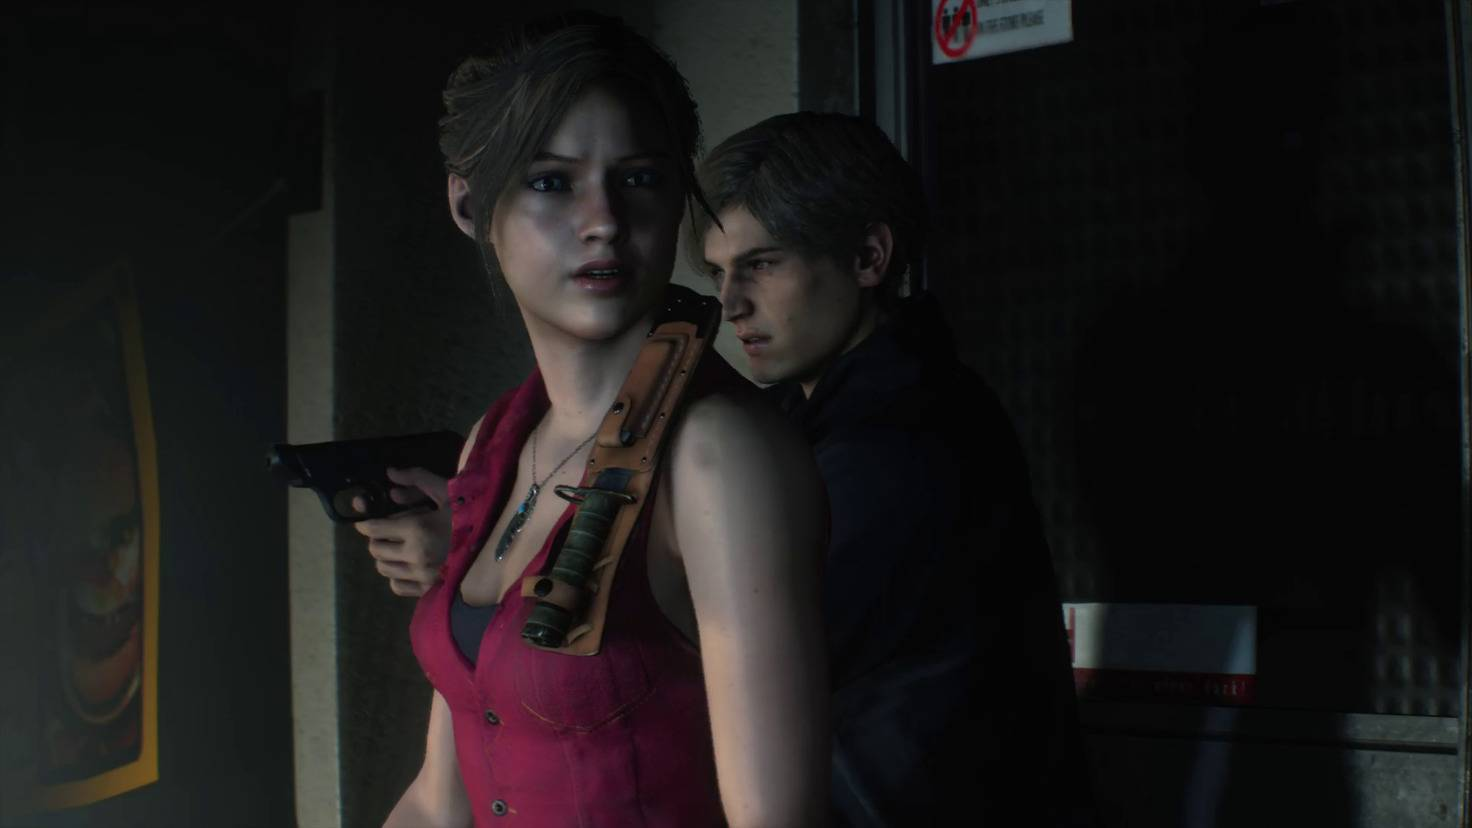 resident-evil-2-claire-leon-intro